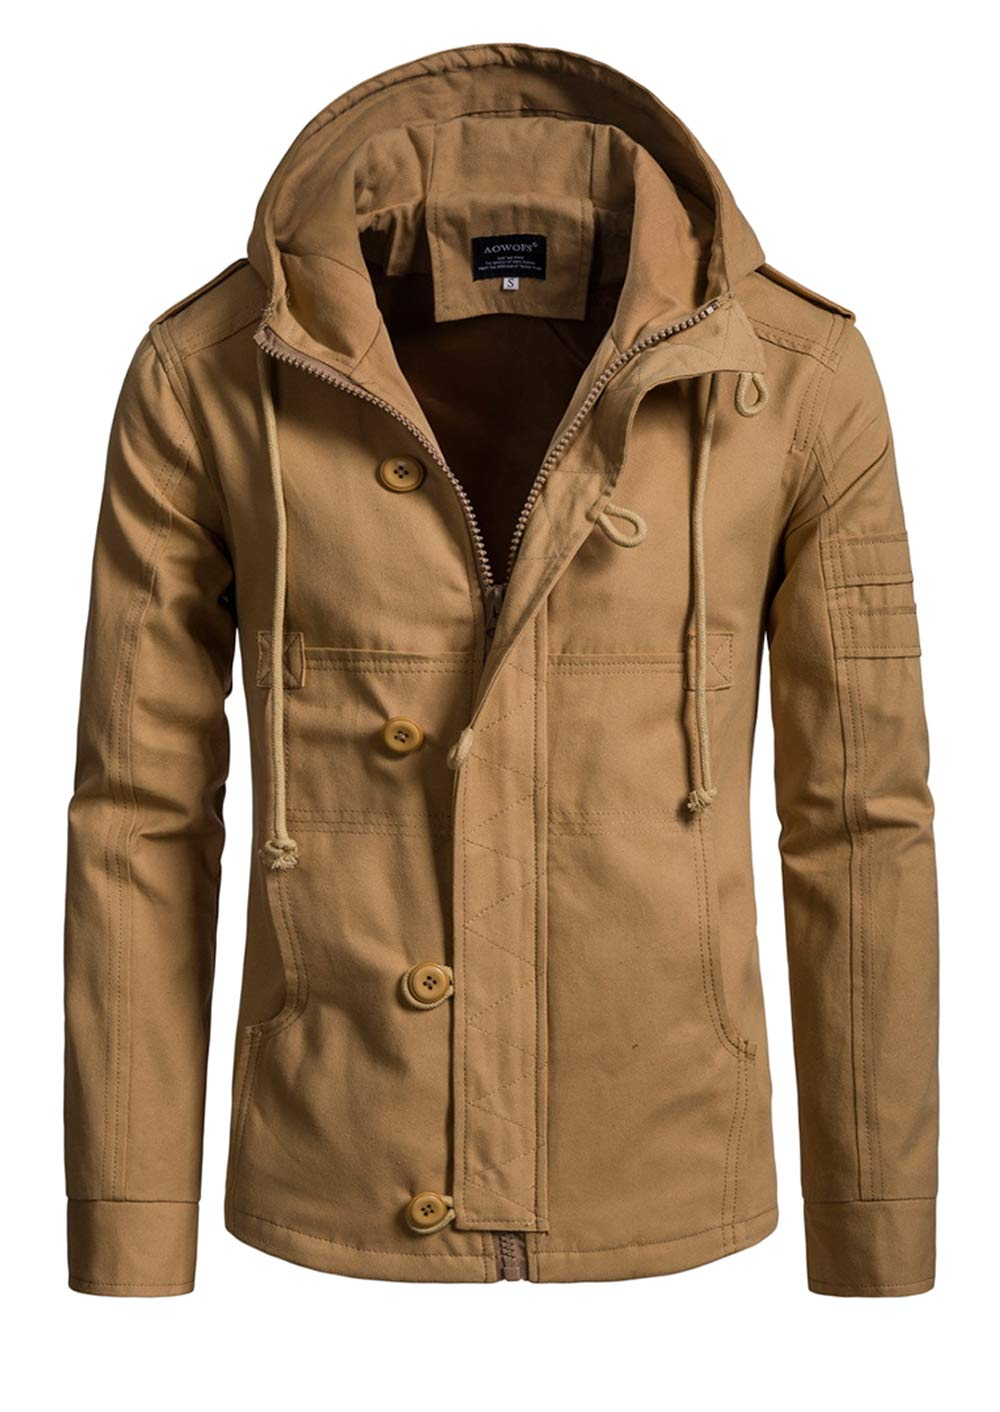 Hakjay Mens Casual Military Jackets Fall Tactical Coats Zip Up Hoodie Khaki by Hakjay